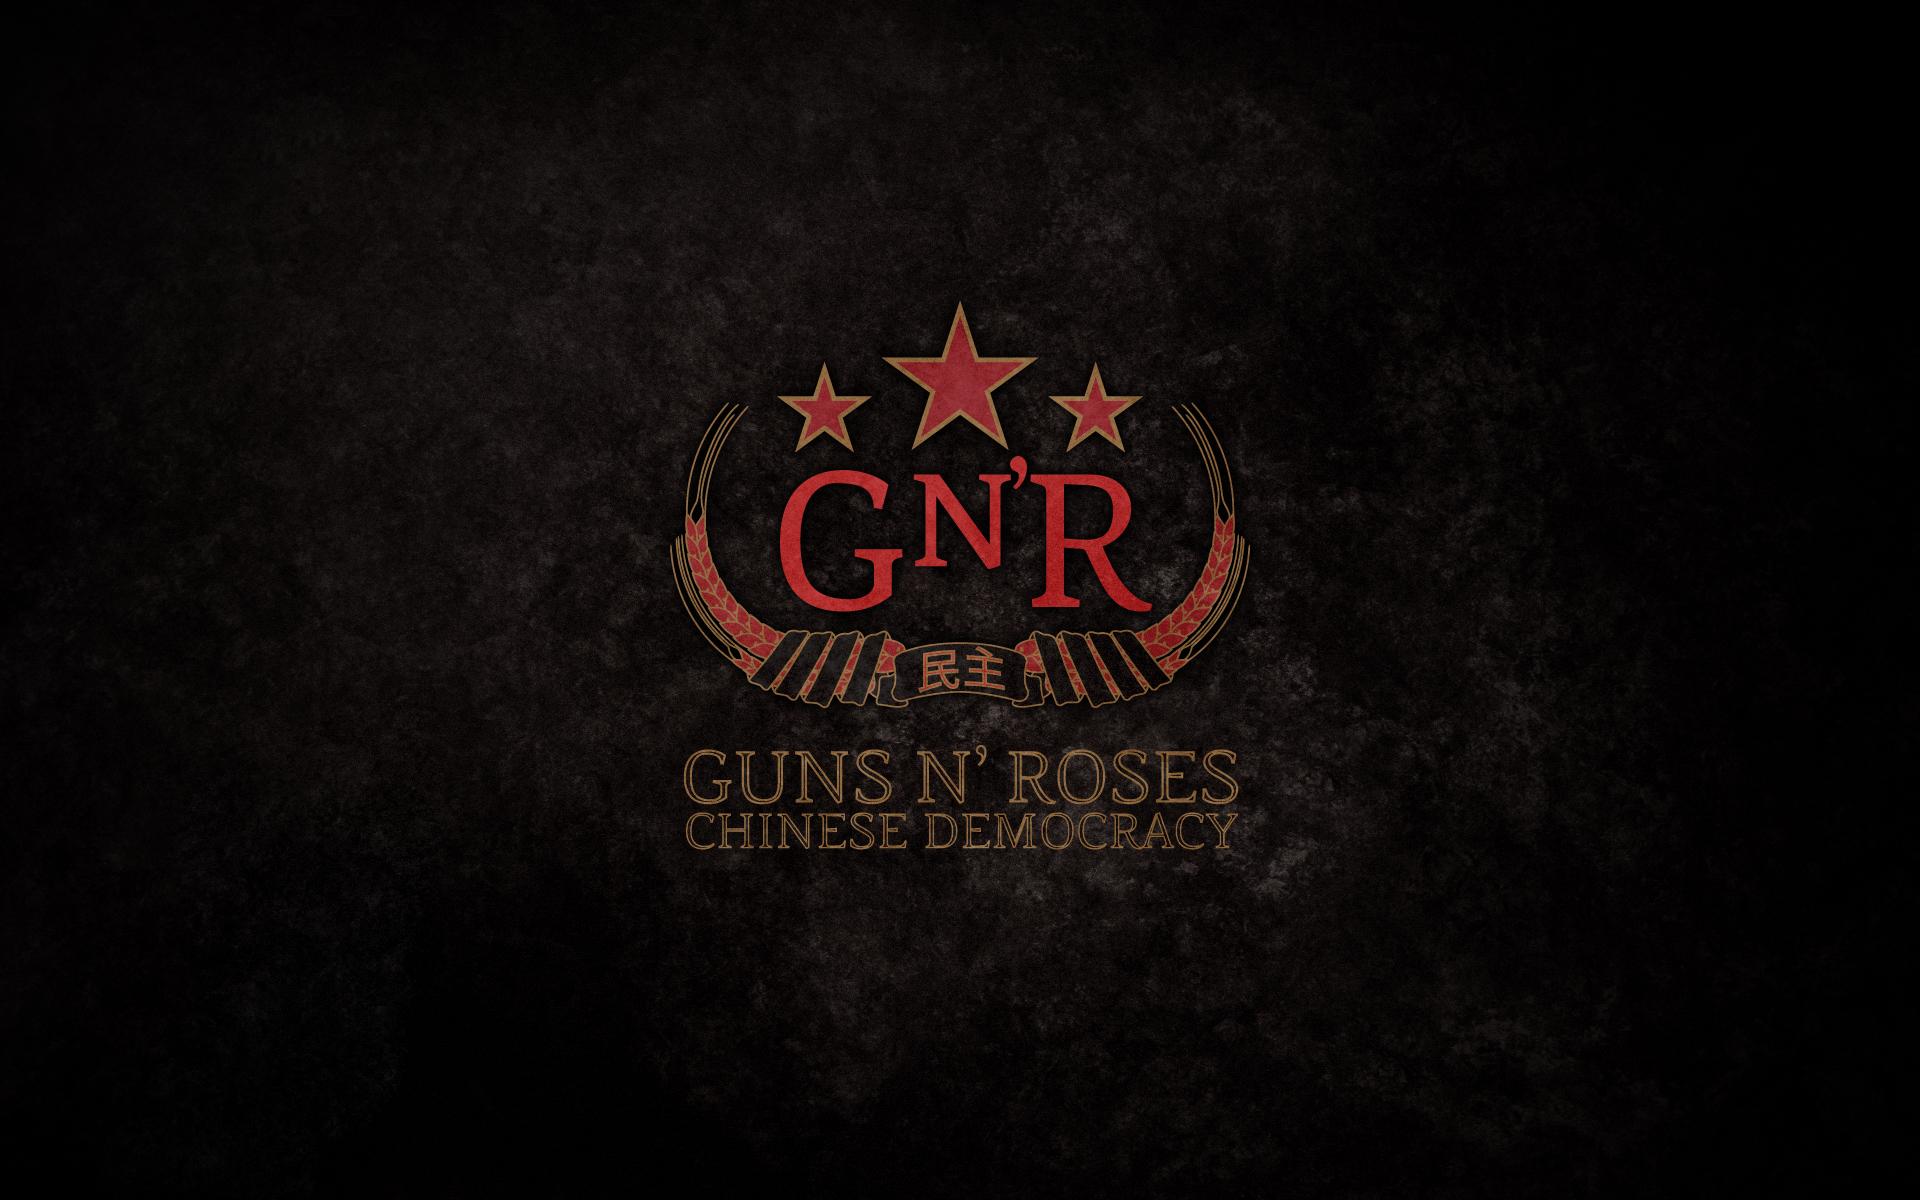 Guns N Roses Wallpapers Music Hq Guns N Roses Pictures: Guns N Roses Computer Wallpapers, Desktop Backgrounds